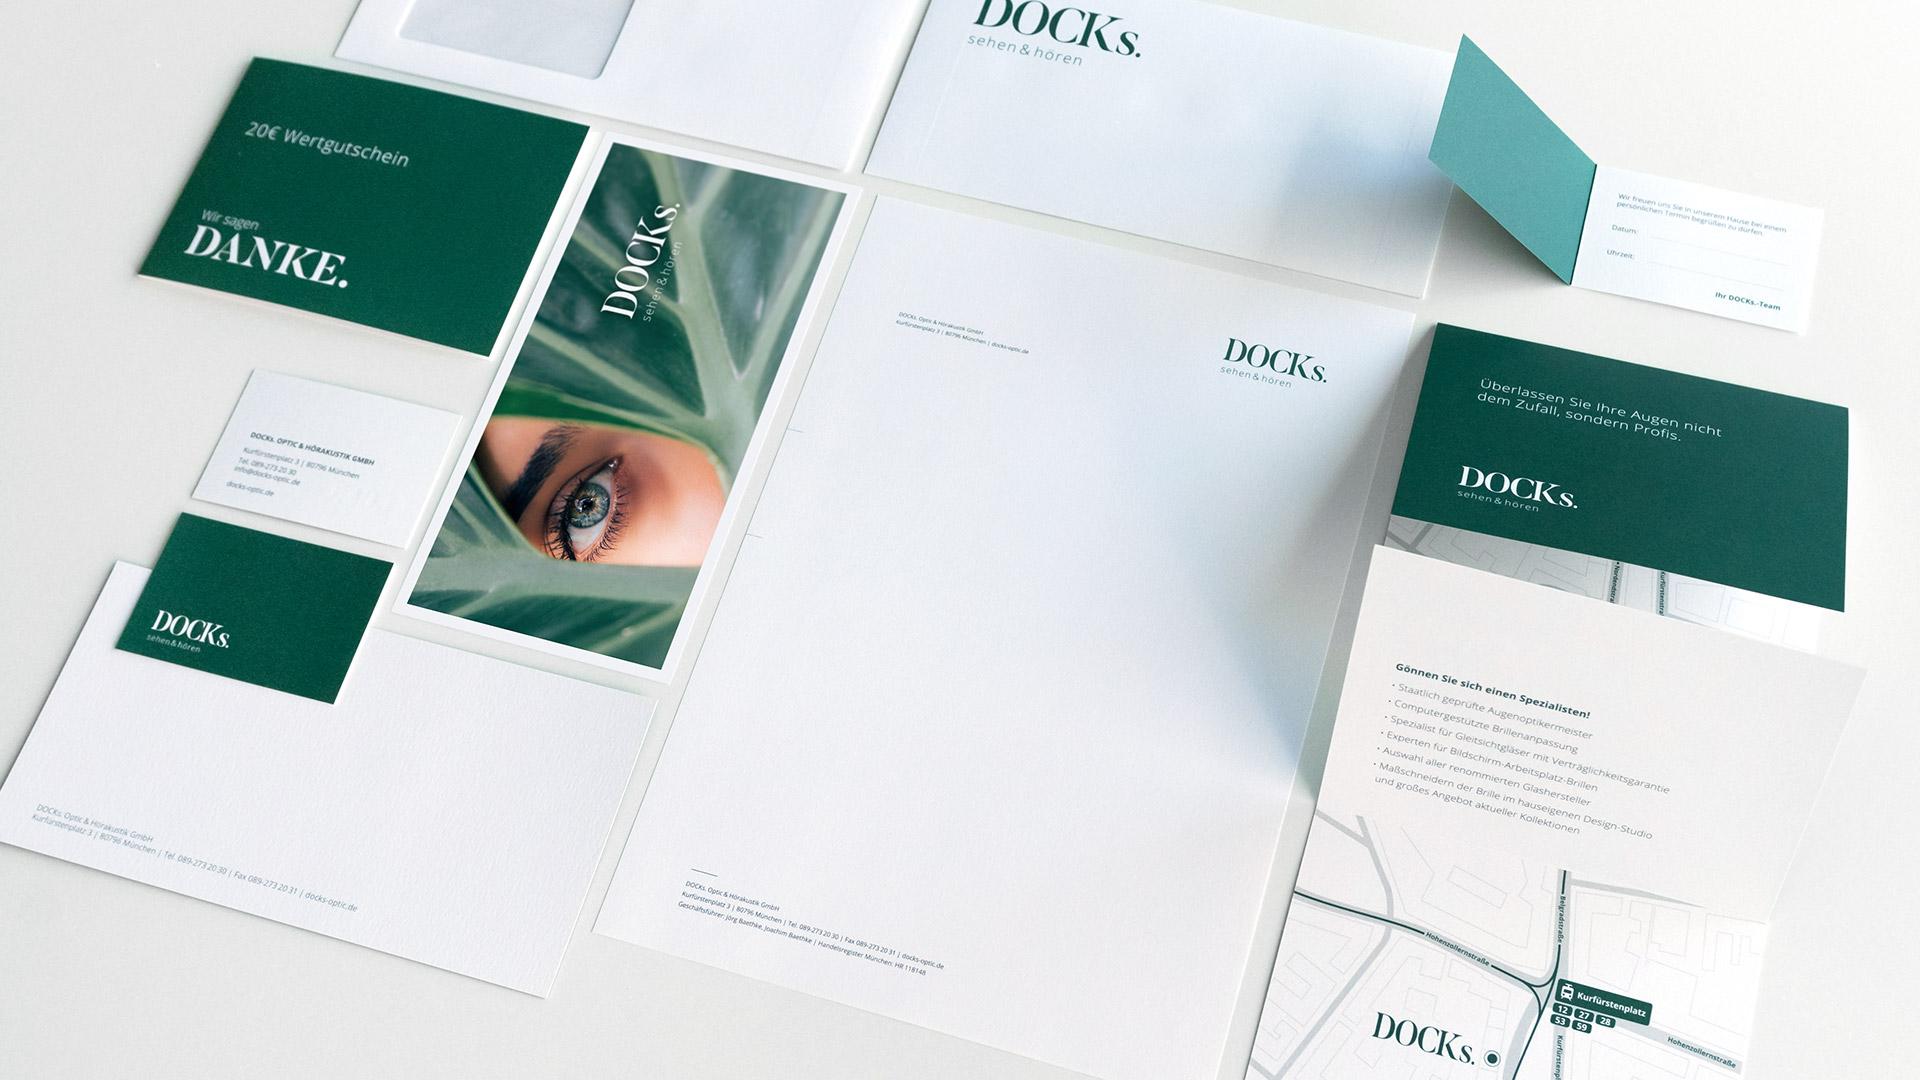 DOCKS sehen & hören Optiker Rebranding Stationery